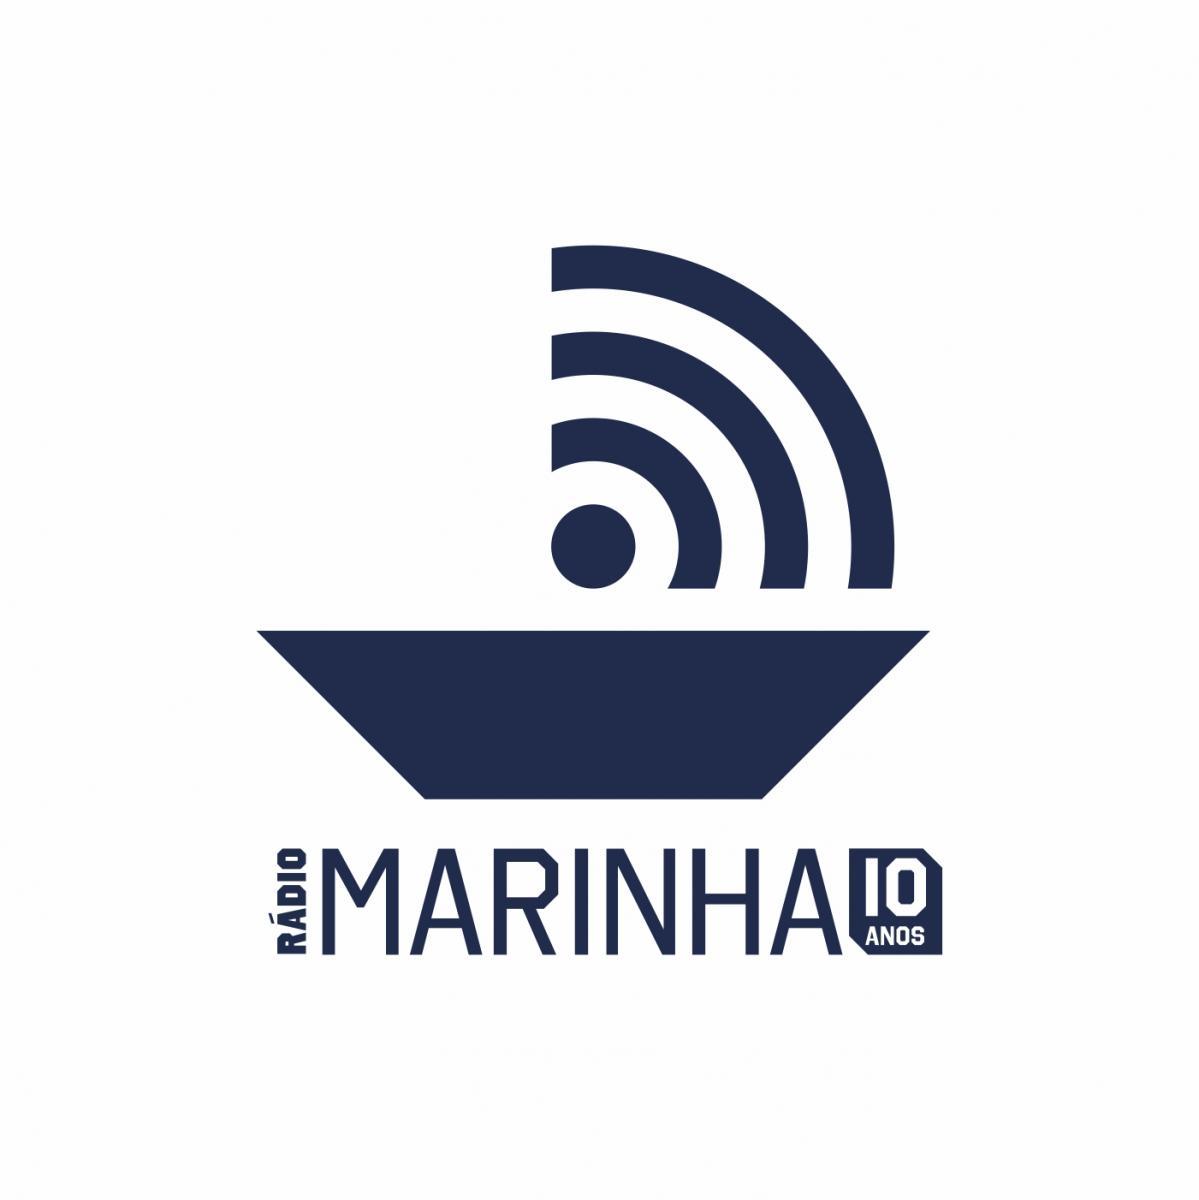 https://www.marinha.mil.br/cppi/sites/www.marinha.mil.br.cppi/files/nova-logo-radio-mb-10-anos-1.jpg